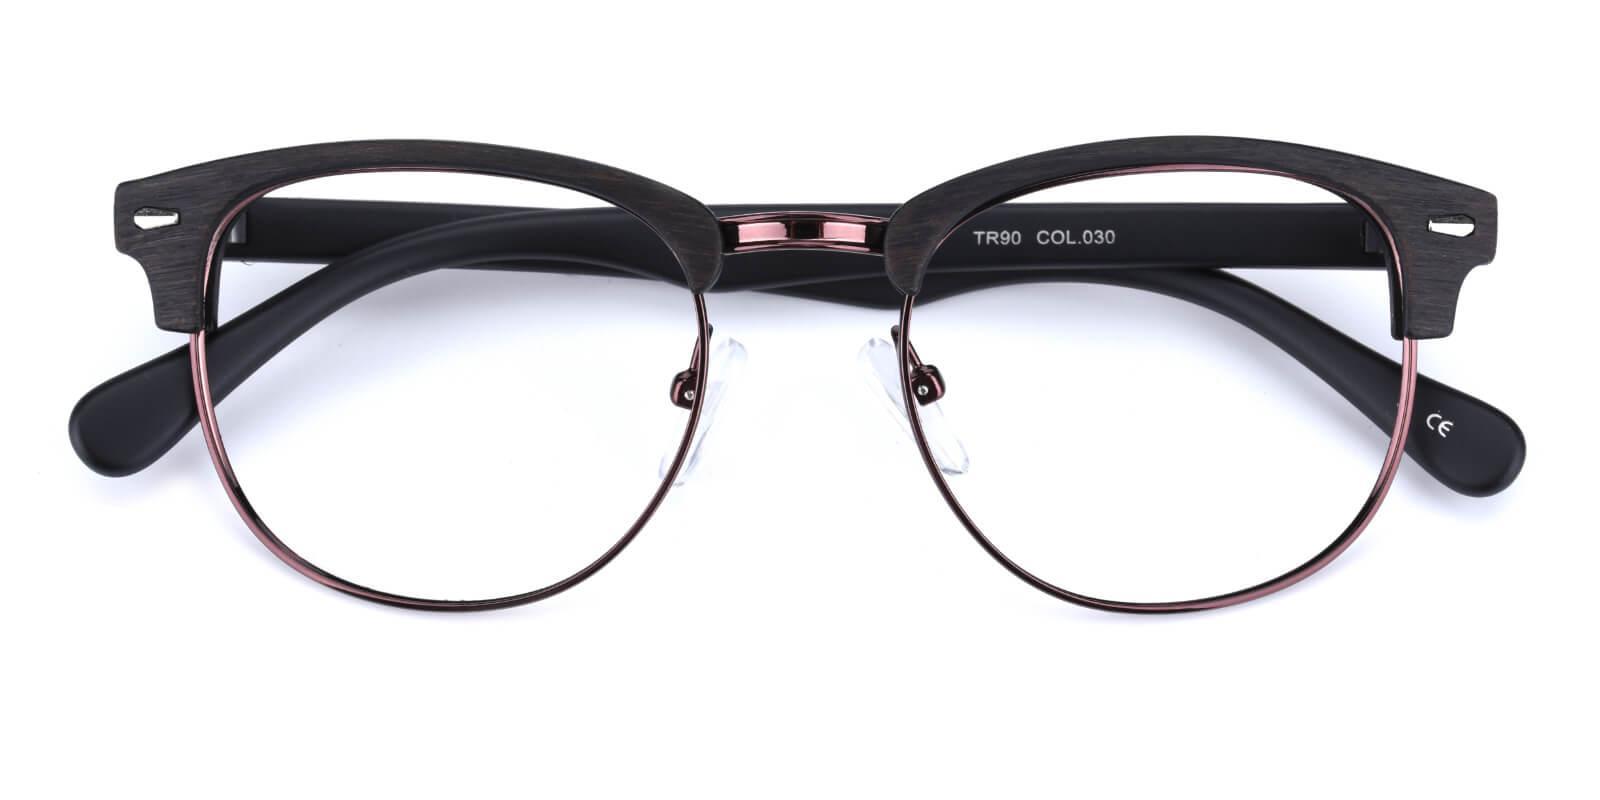 Ferrous-Gun-Browline-Metal / Combination / Plastic-Eyeglasses-detail